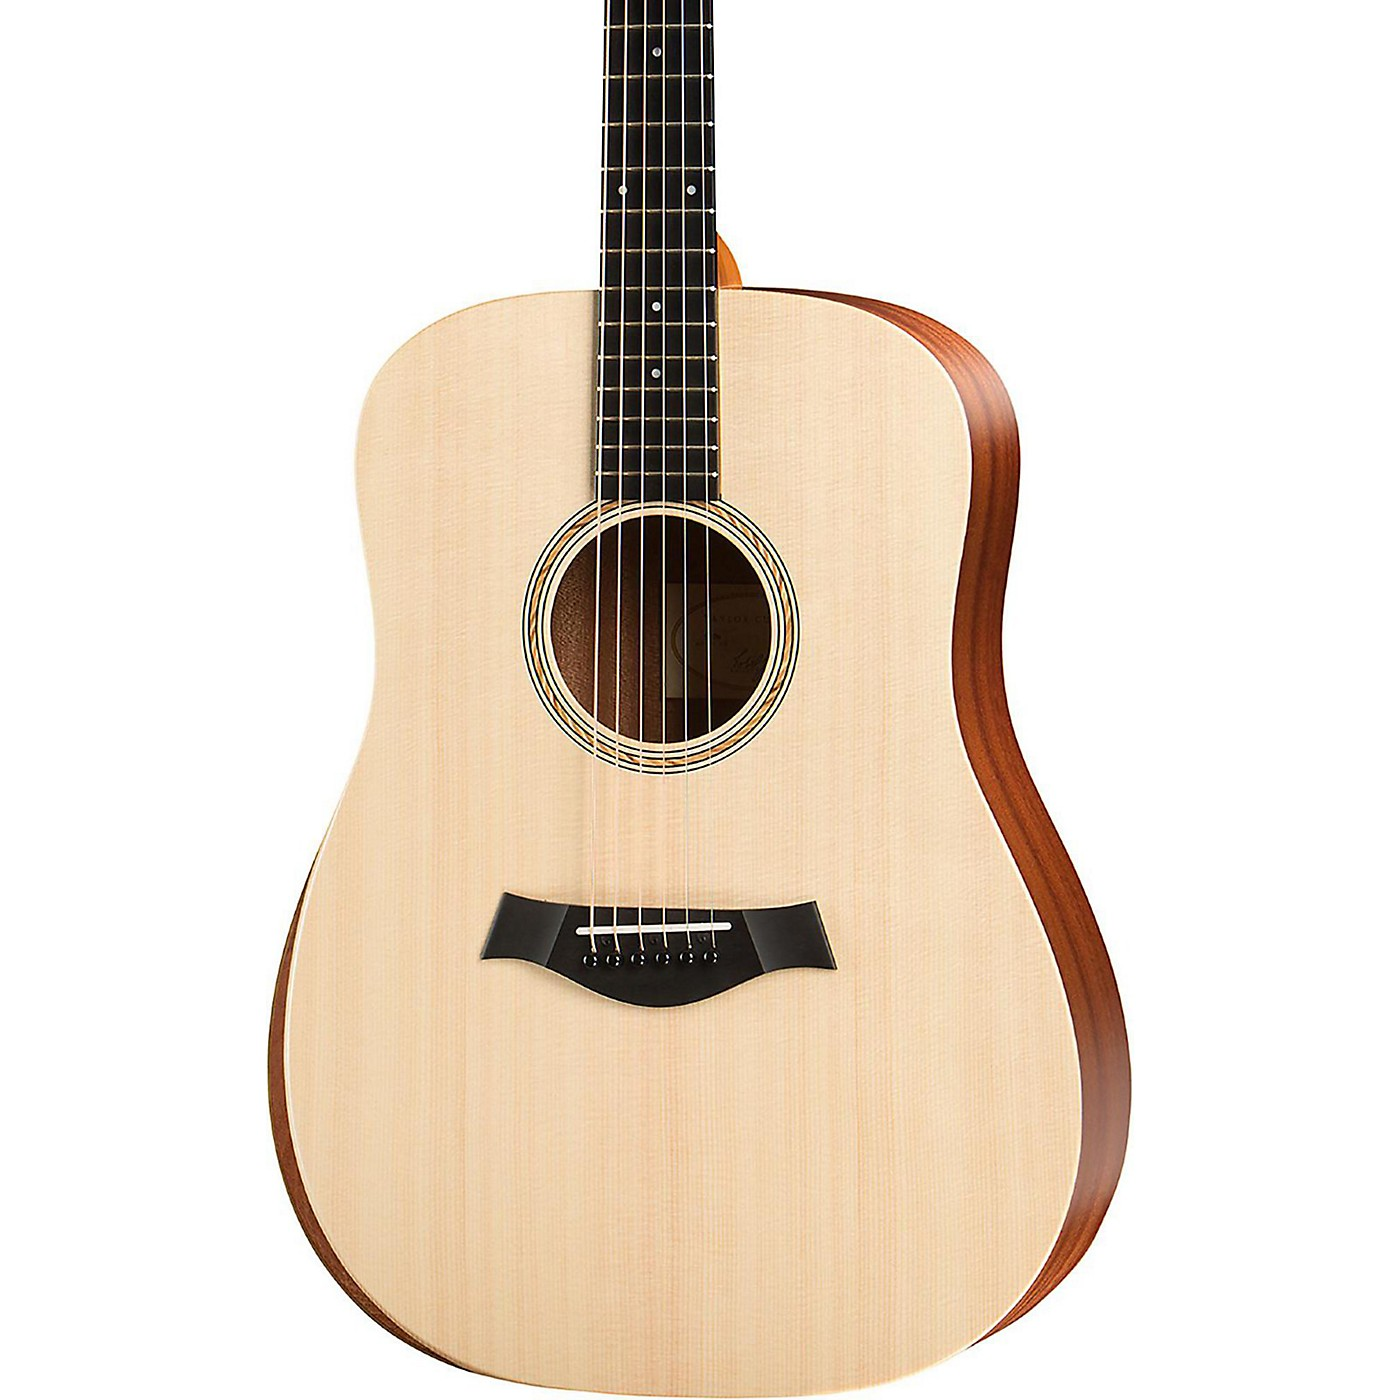 Taylor Academy Series Academy 10 Dreadnought Acoustic Guitar thumbnail